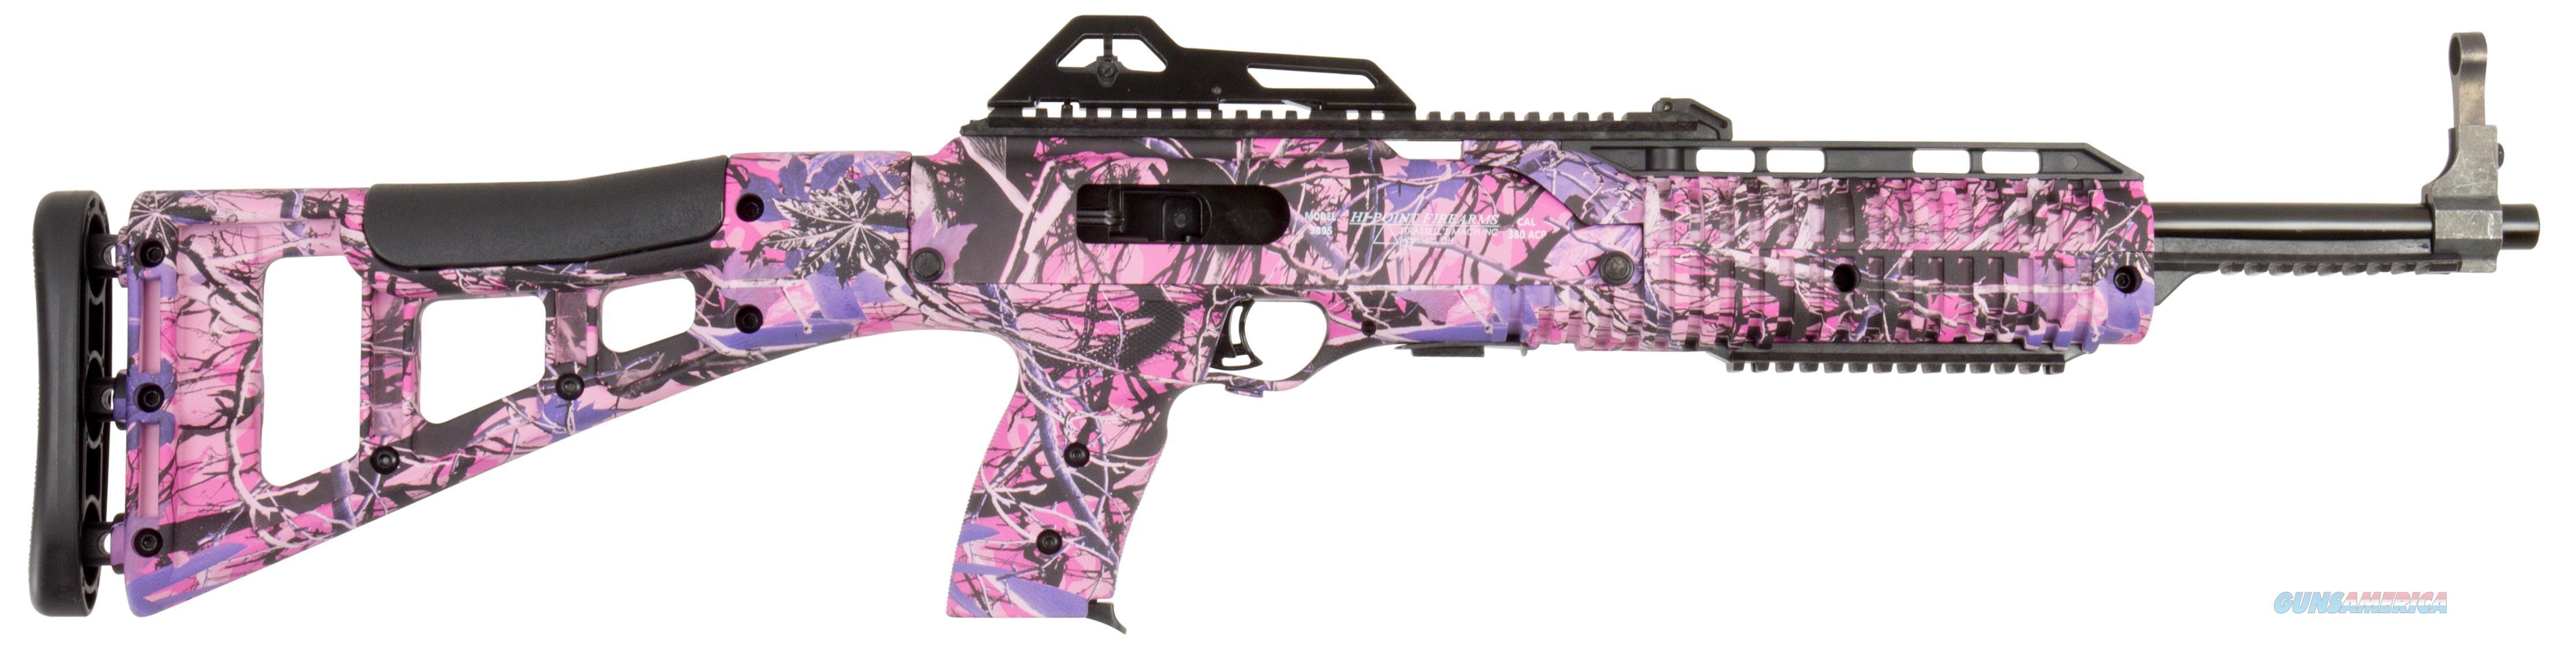 "Hi-Point 3895Tspi 3895Ts Carbine  Semi-Automatic 380 Automatic Colt Pistol (Acp) 16.5"" 10+1 Polymer Skeleton Country Girl Camo Stk Country Girl Camo 3895TS PI  Guns > Rifles > H Misc Rifles"